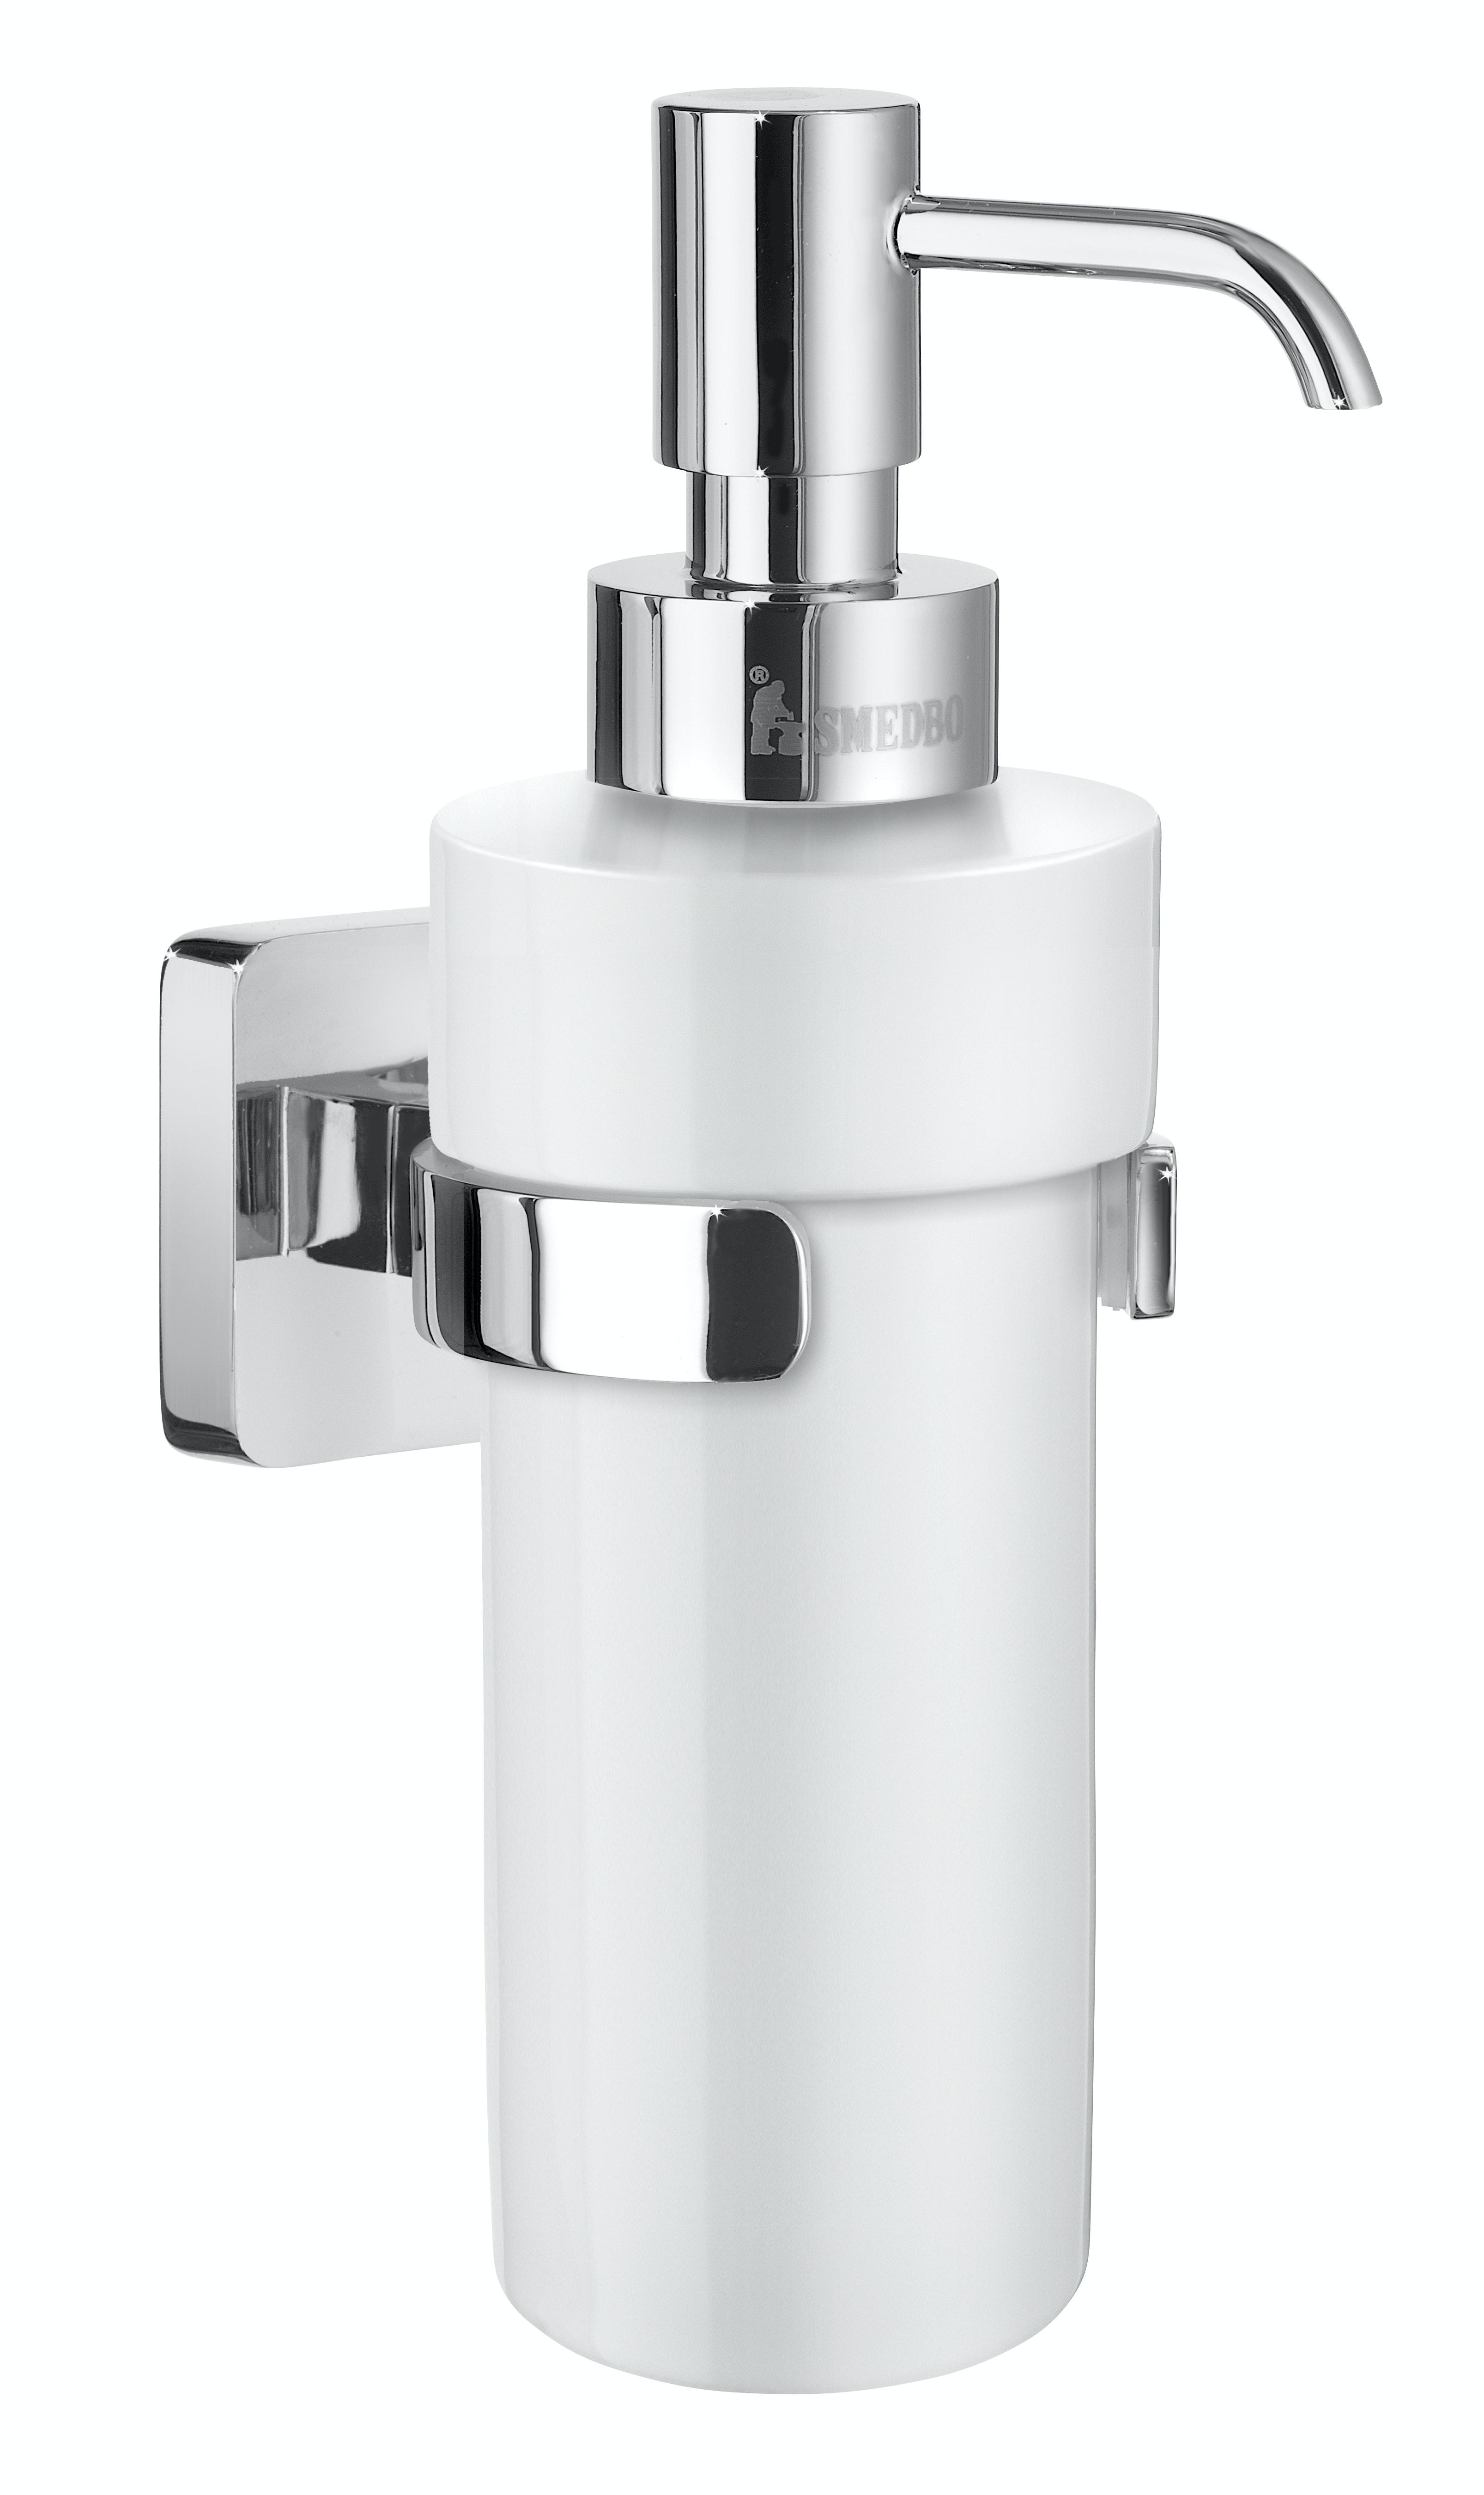 Tvålpump Smedbo Ice Porslin Väggmontage Krom